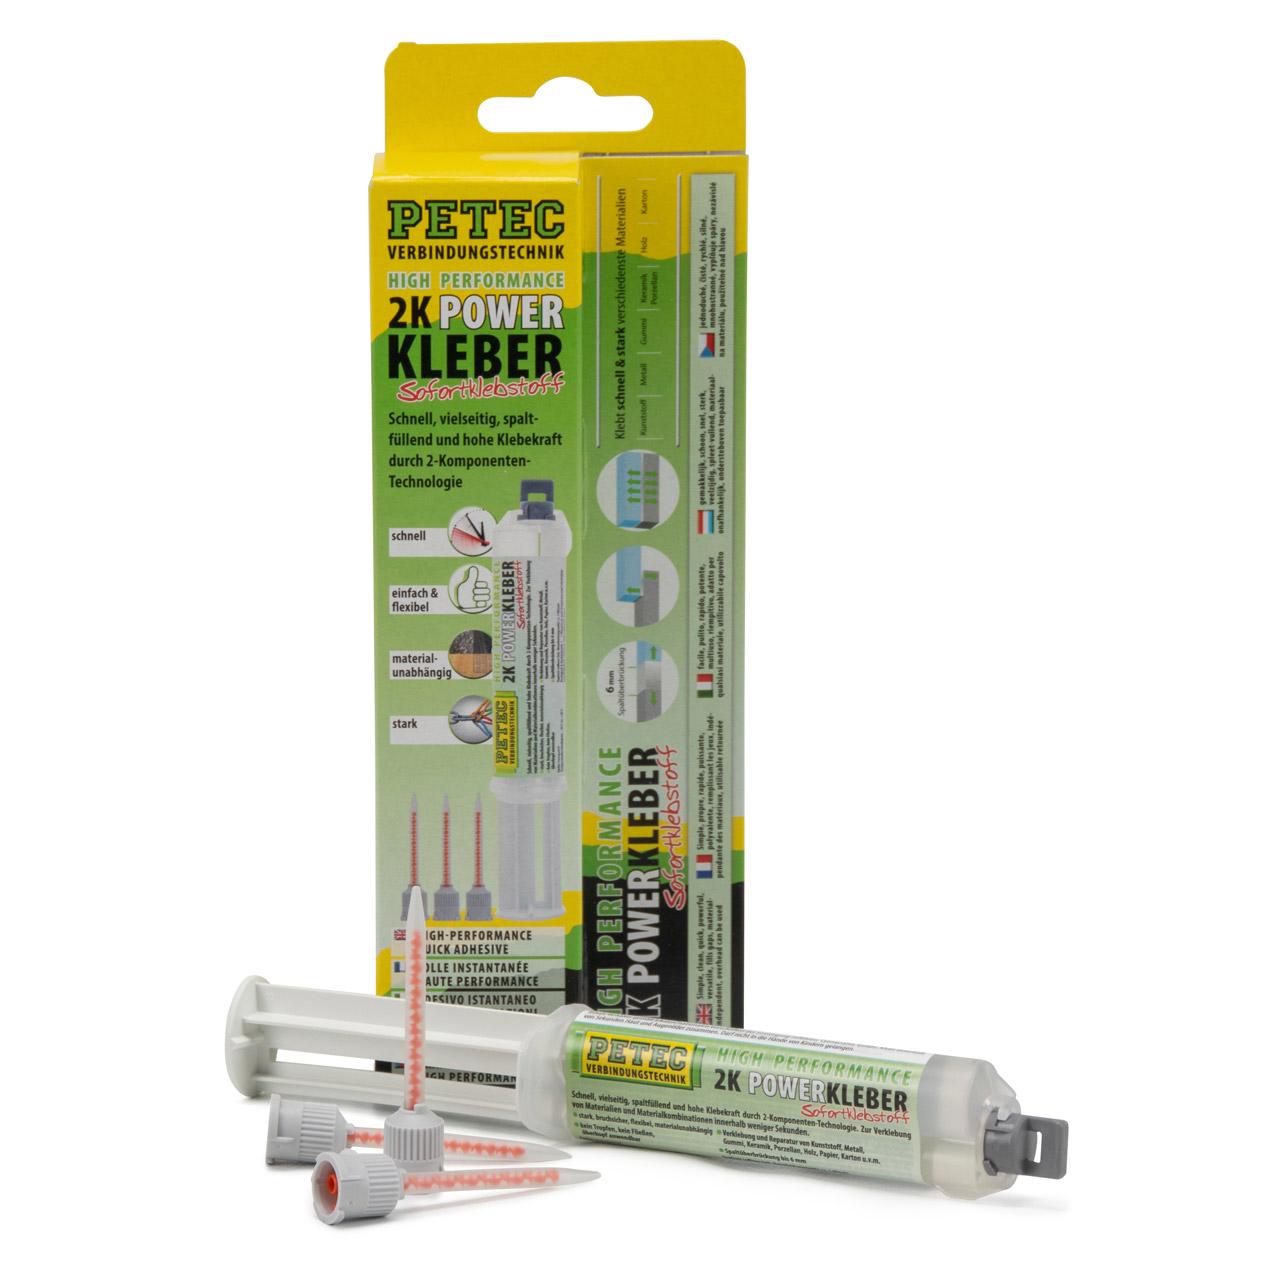 PETEC 93510 2K Power Kleber Klebstoff 2-Komponenten Universalkleber 11ml